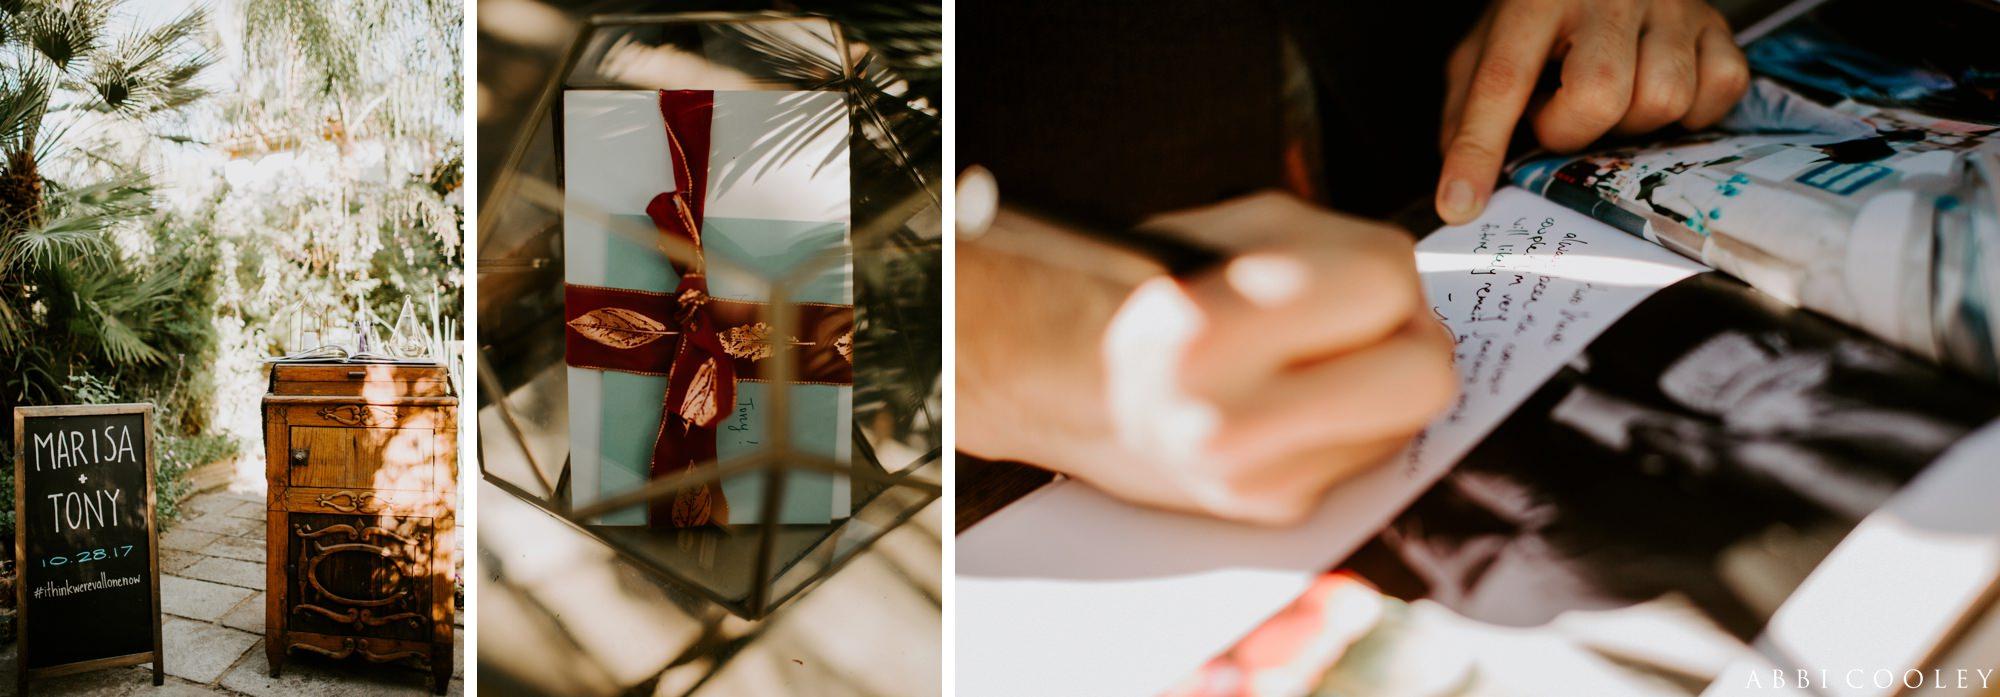 ABBI COOLEY PALM SPRINGS WEDDING_0799